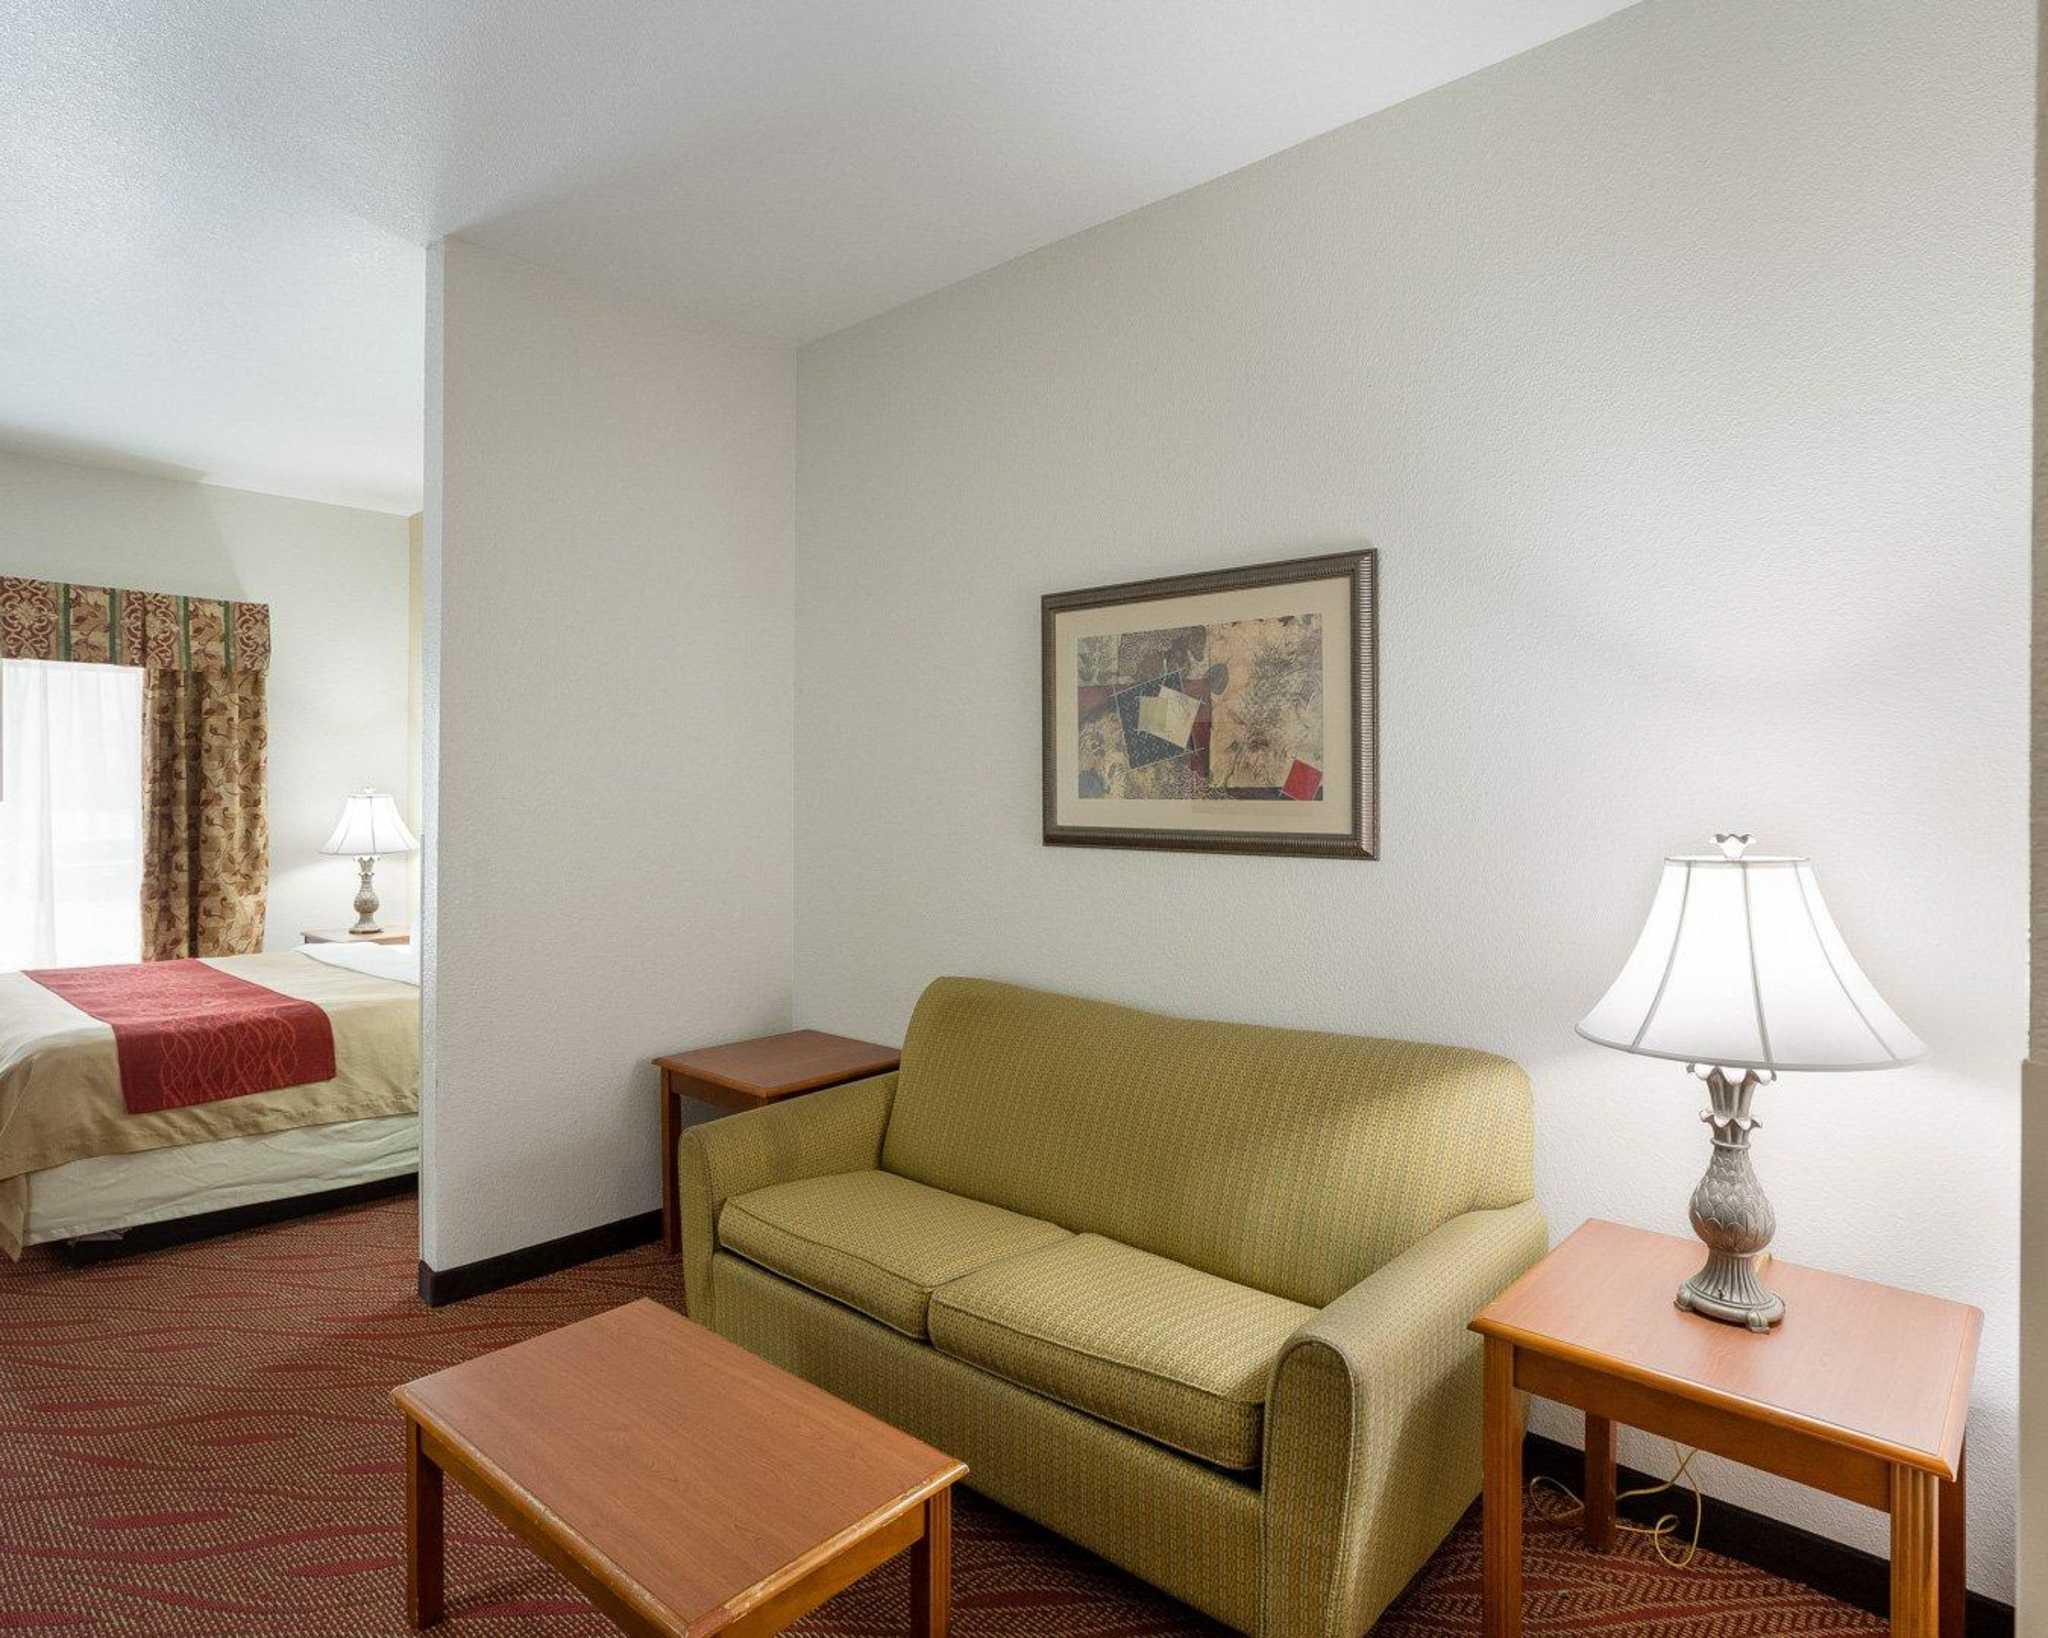 Comfort Inn & Suites Near Medical Center image 20